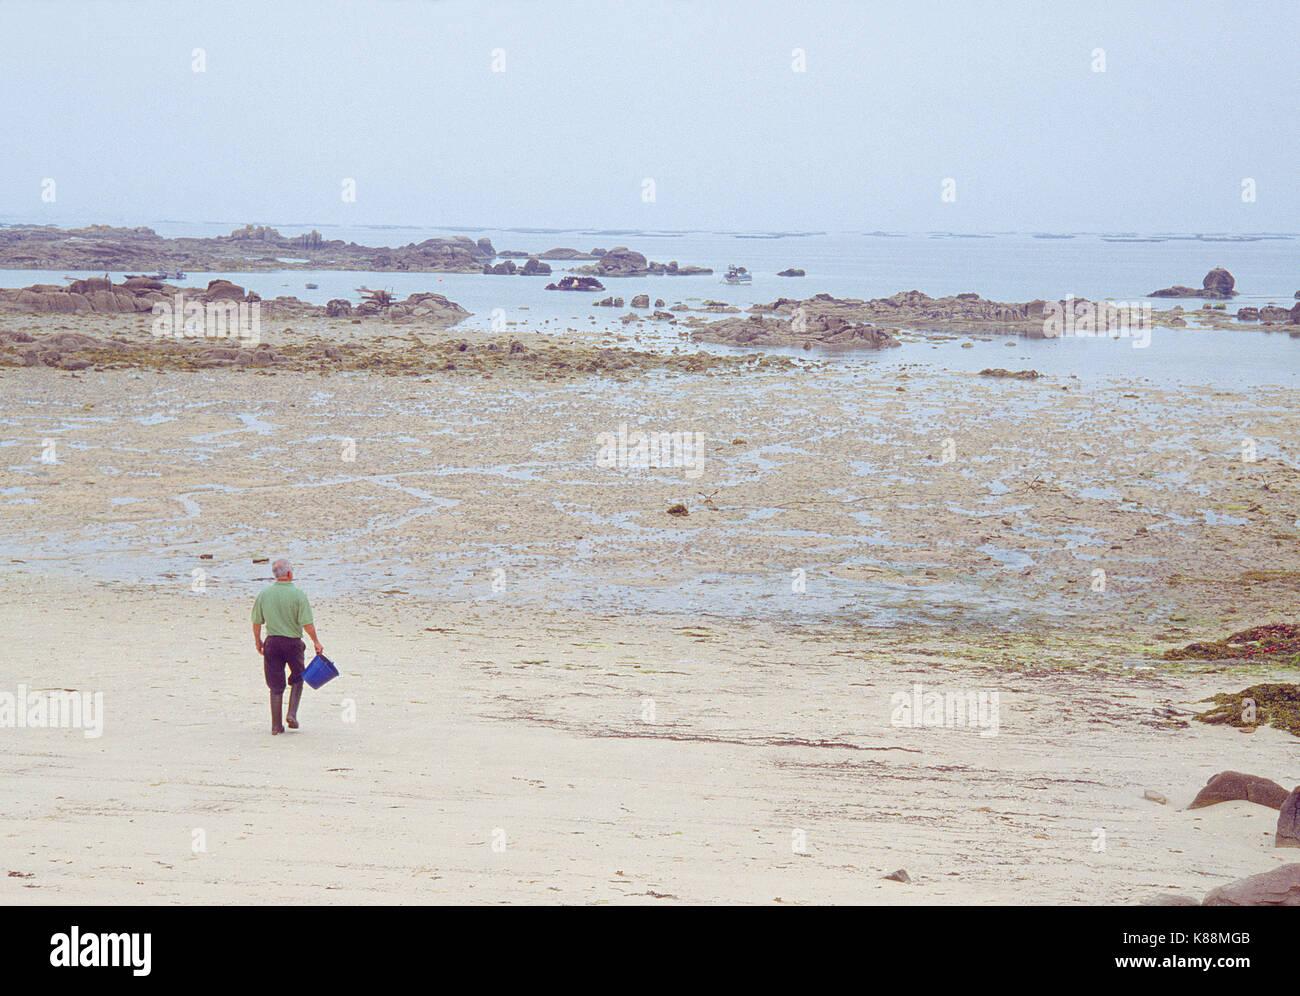 Shellfish catcher walking along the beach in low tide. Carreiron Nature Reserve, Arosa Island, Pontevedra province, - Stock Image